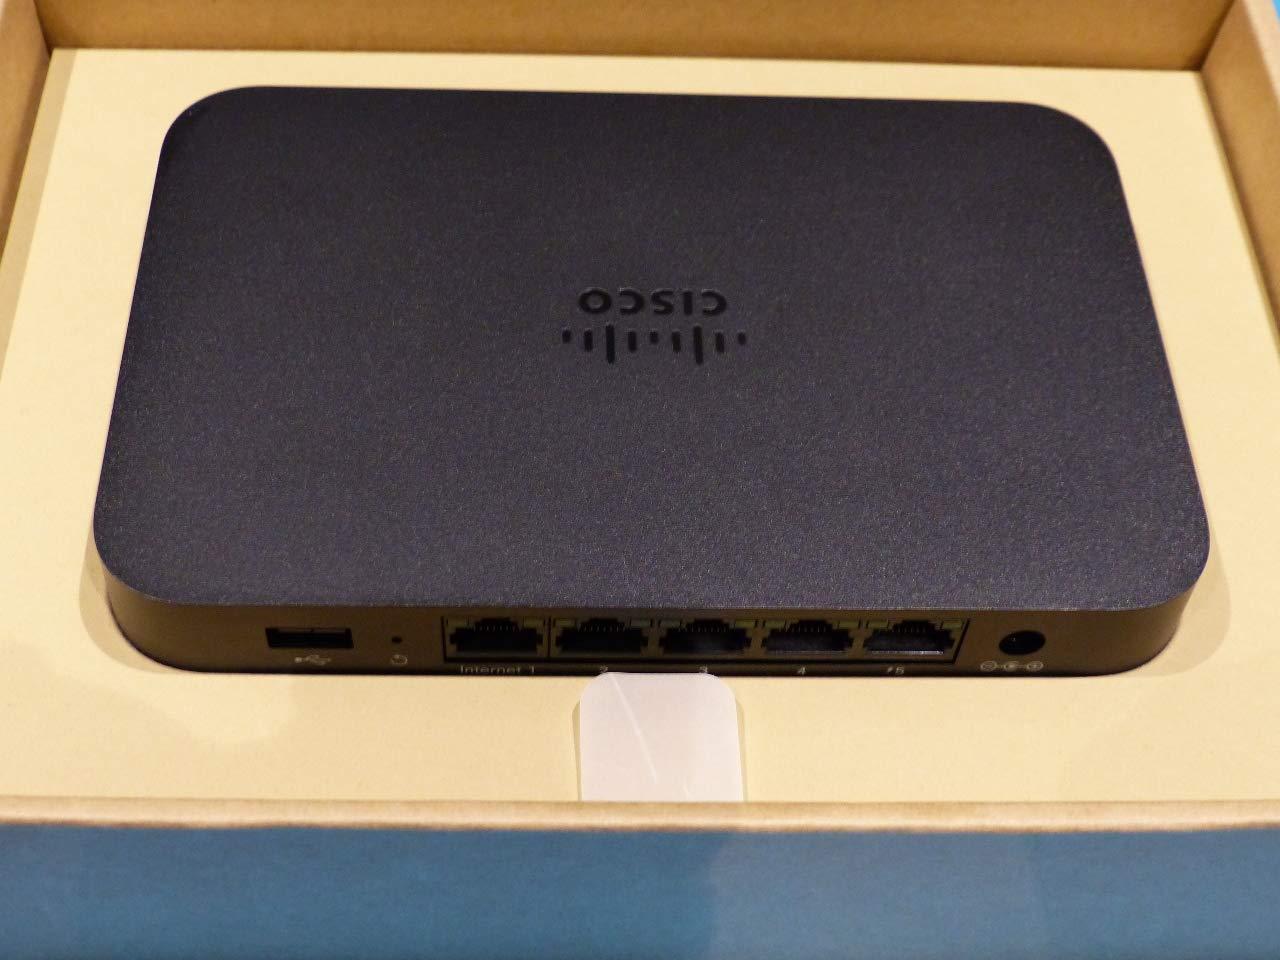 Cisco Meraki Z3 teleworker gateway - Security appliance